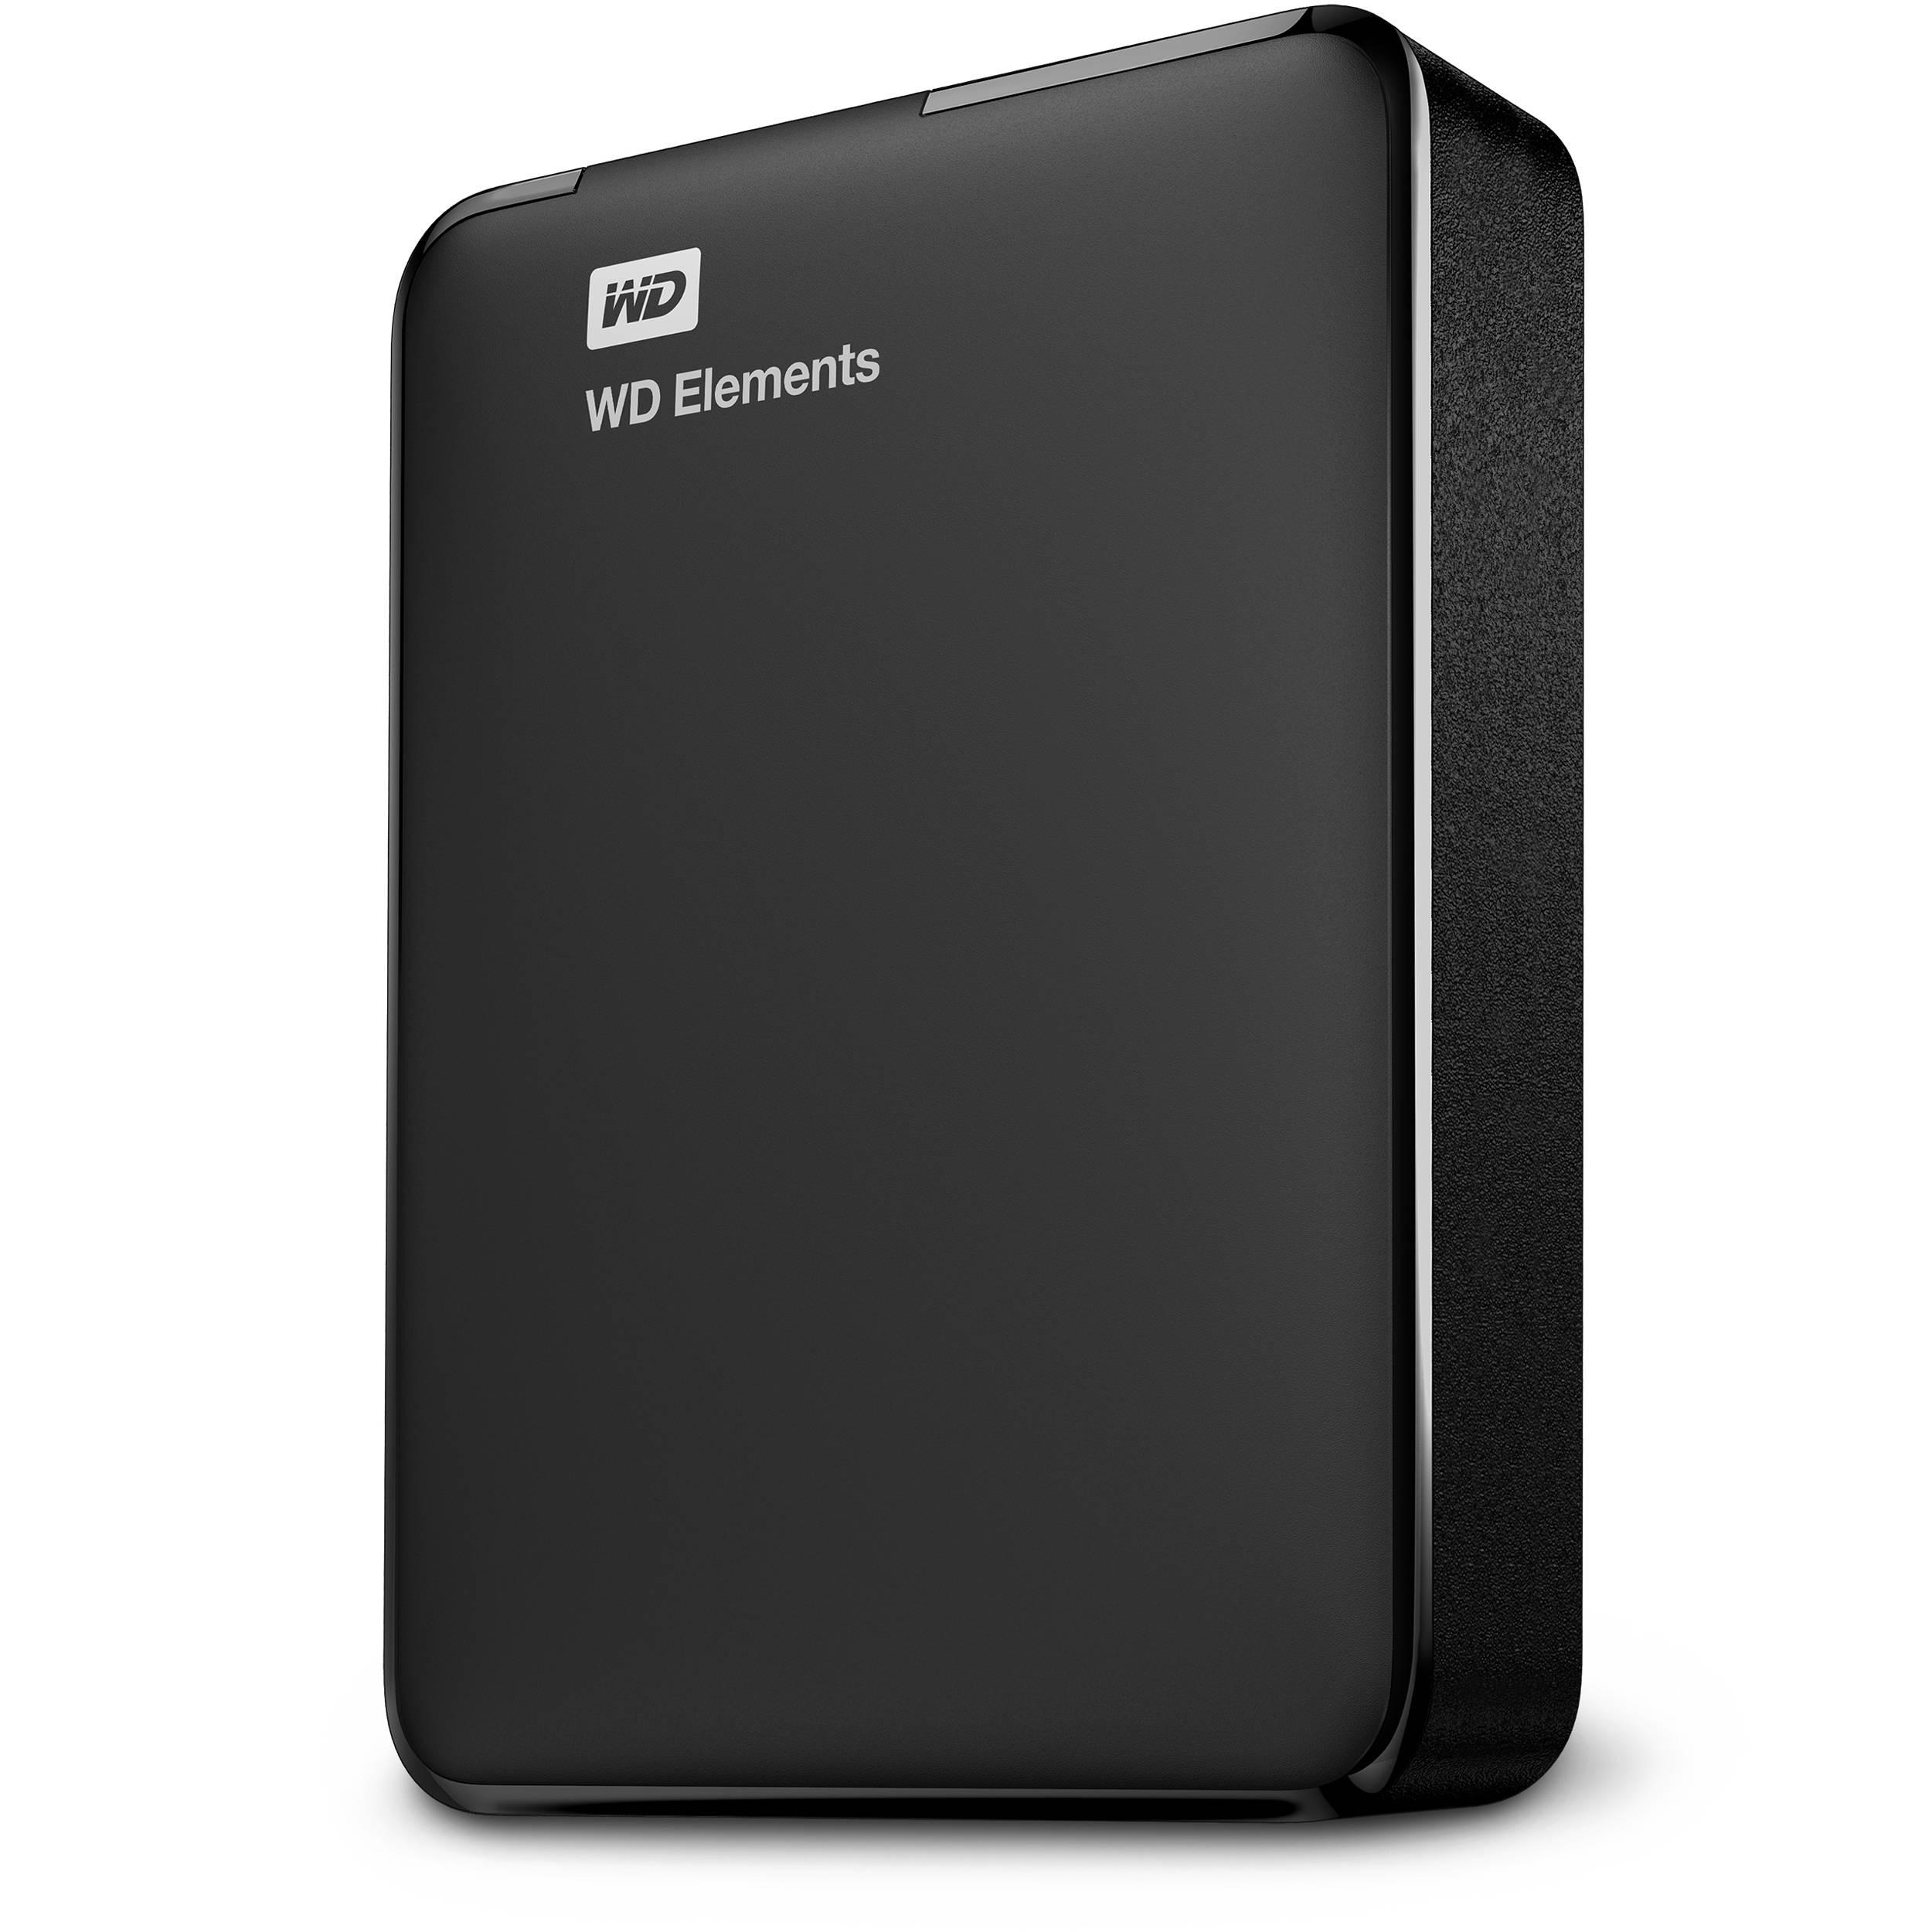 Western Digital 1TB Elements Portable External Hard Drive